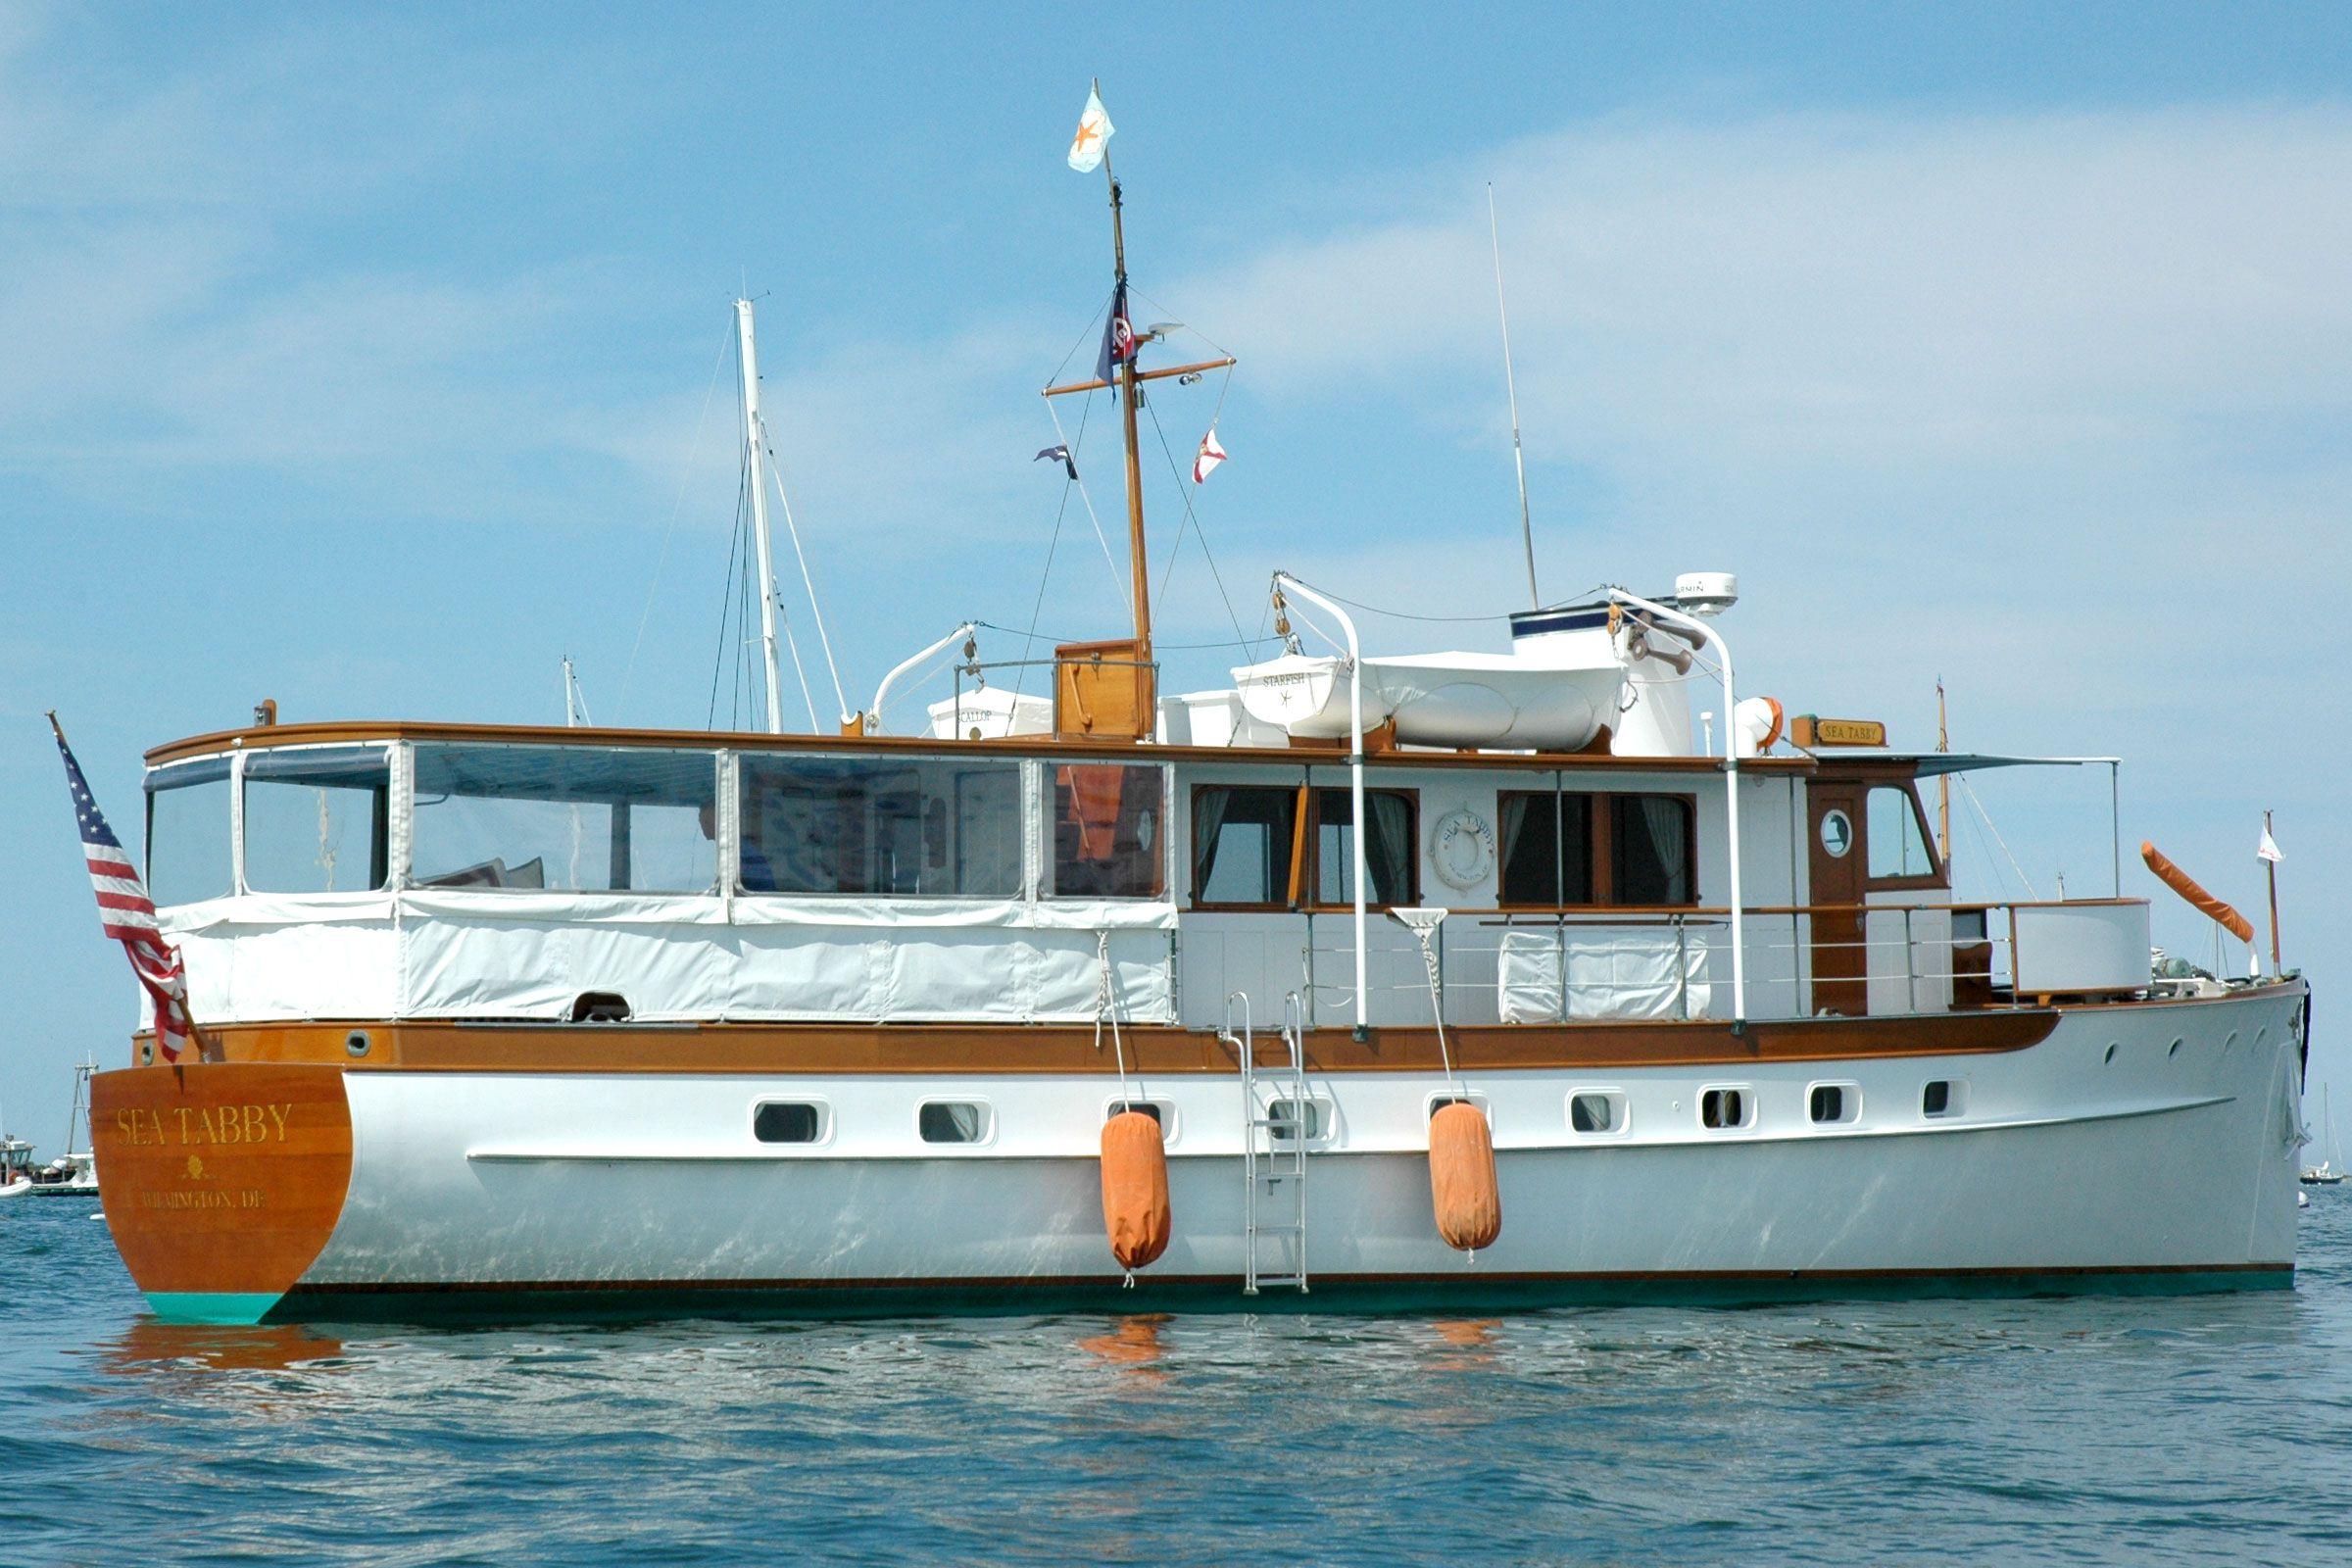 Yacht Spotting: Nantucket Island | Yachting